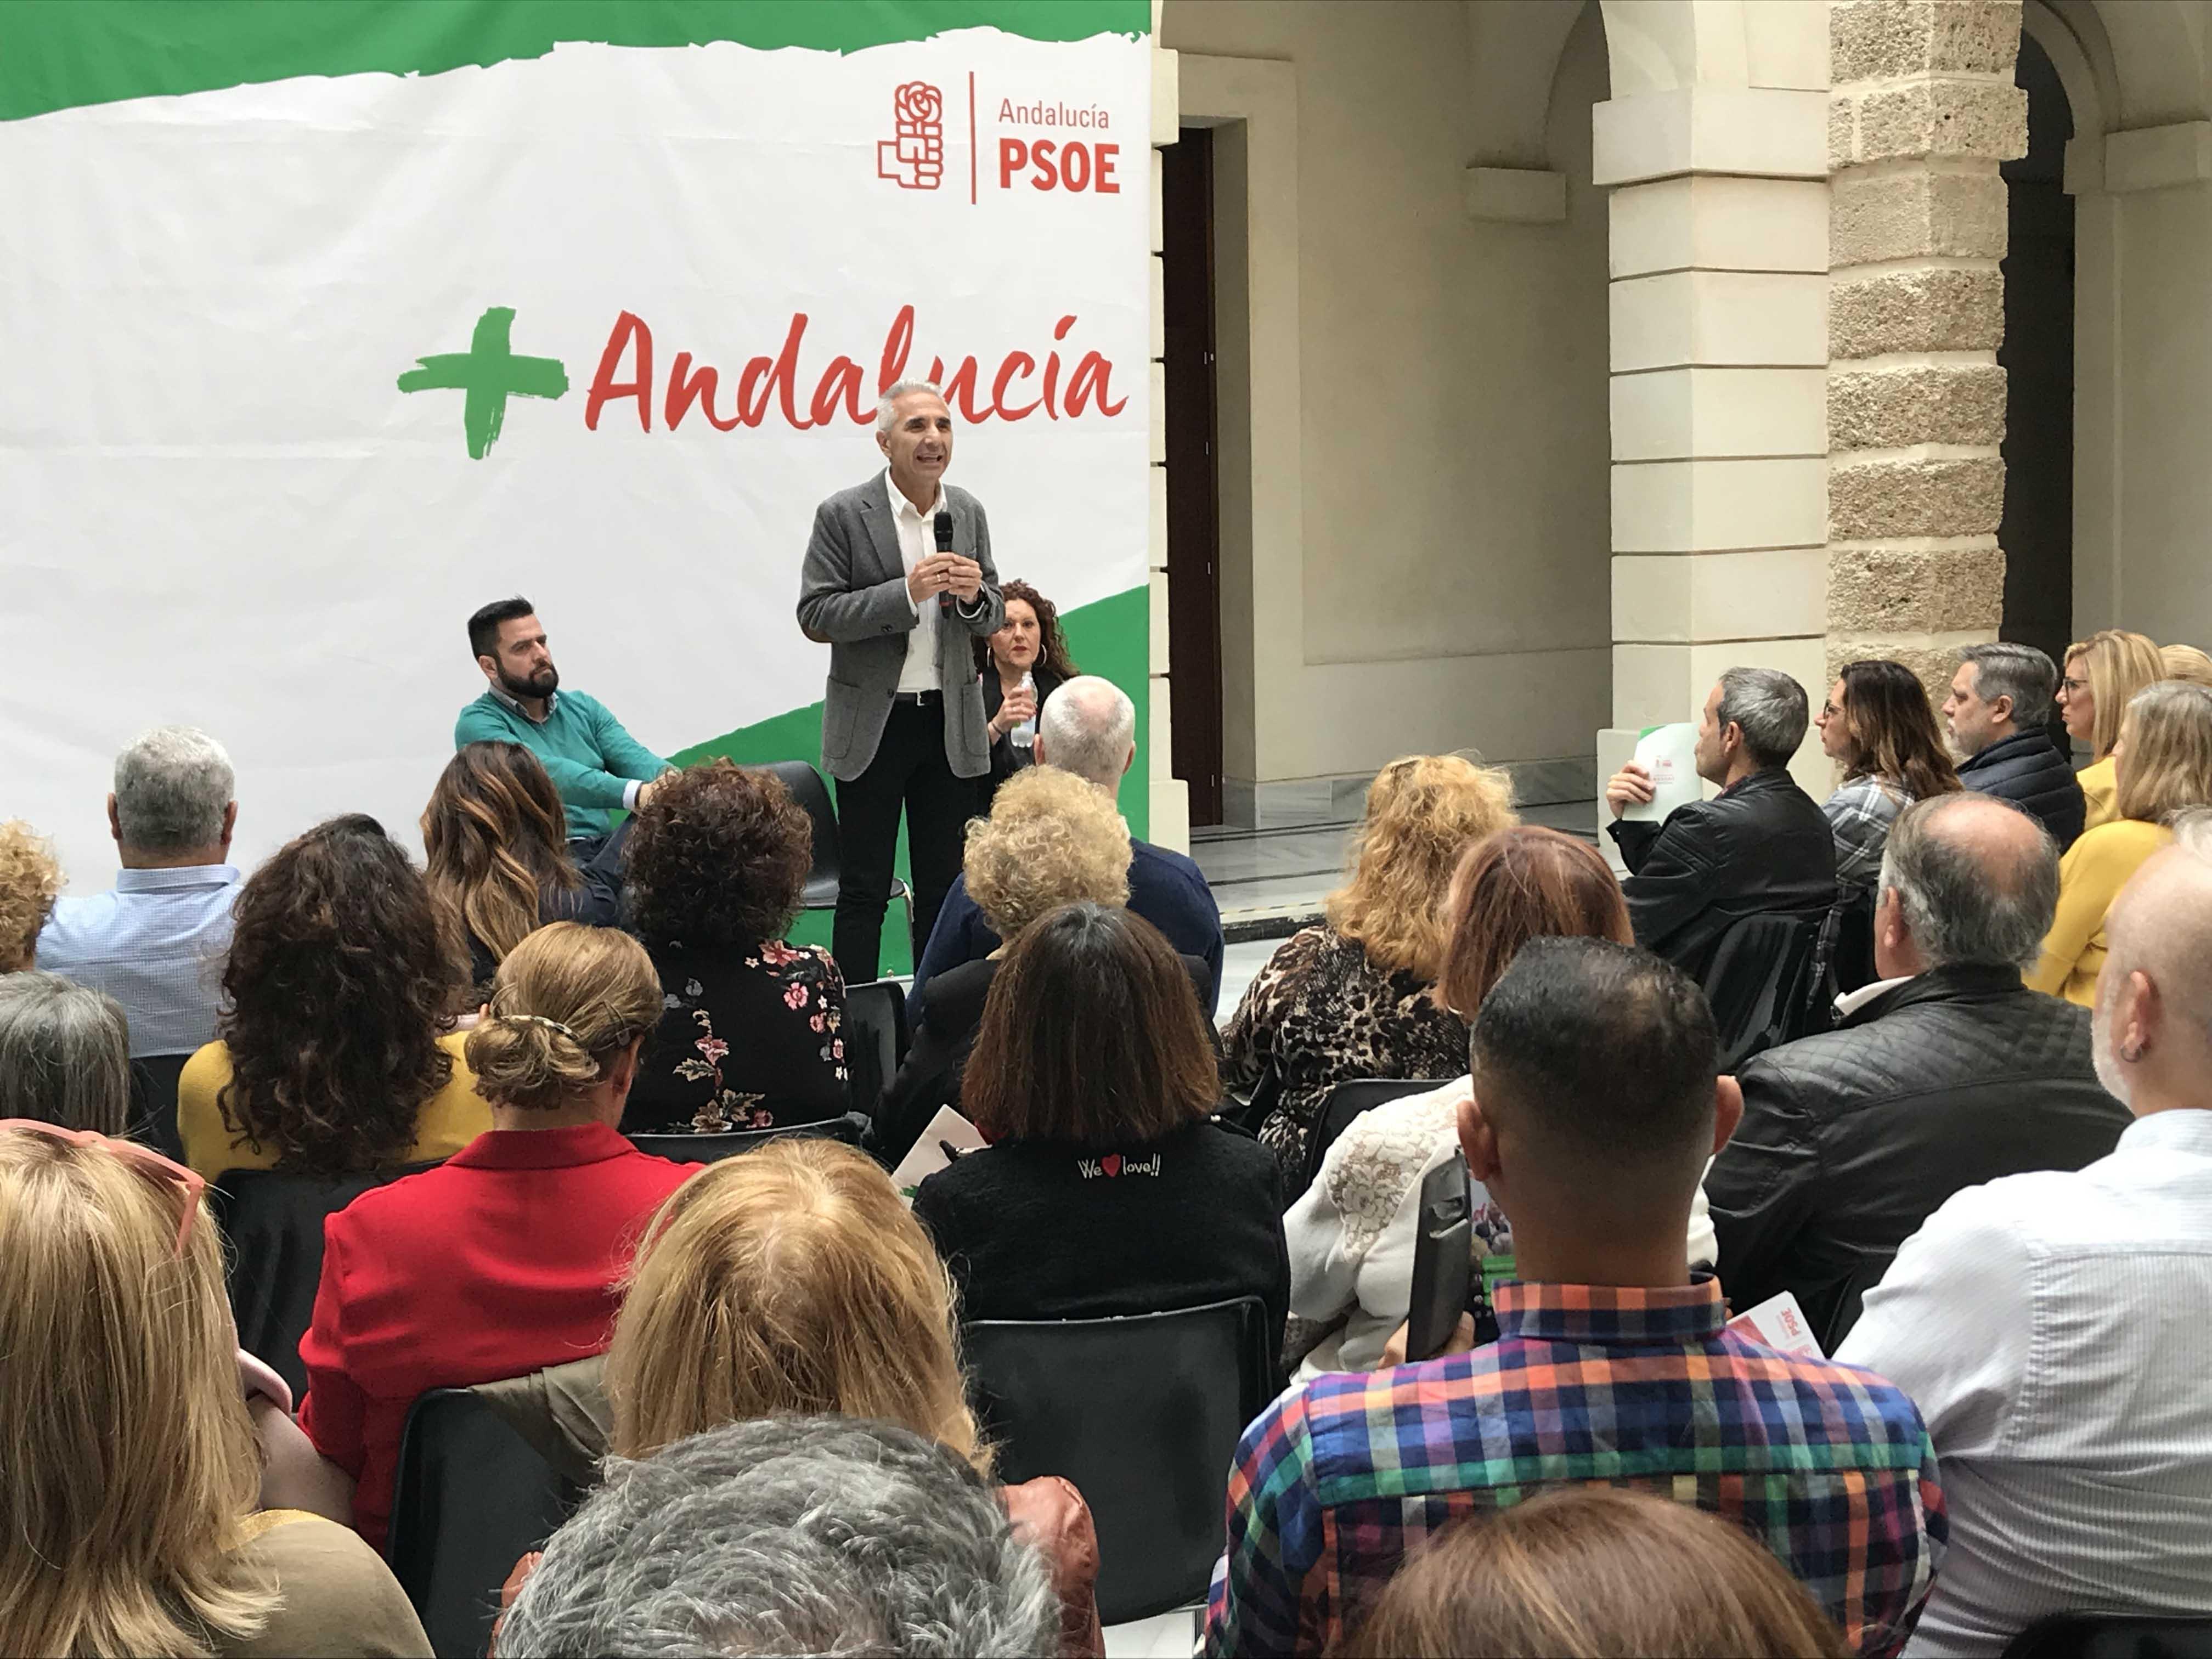 ENCUENTRO CULTURA PSOE 4